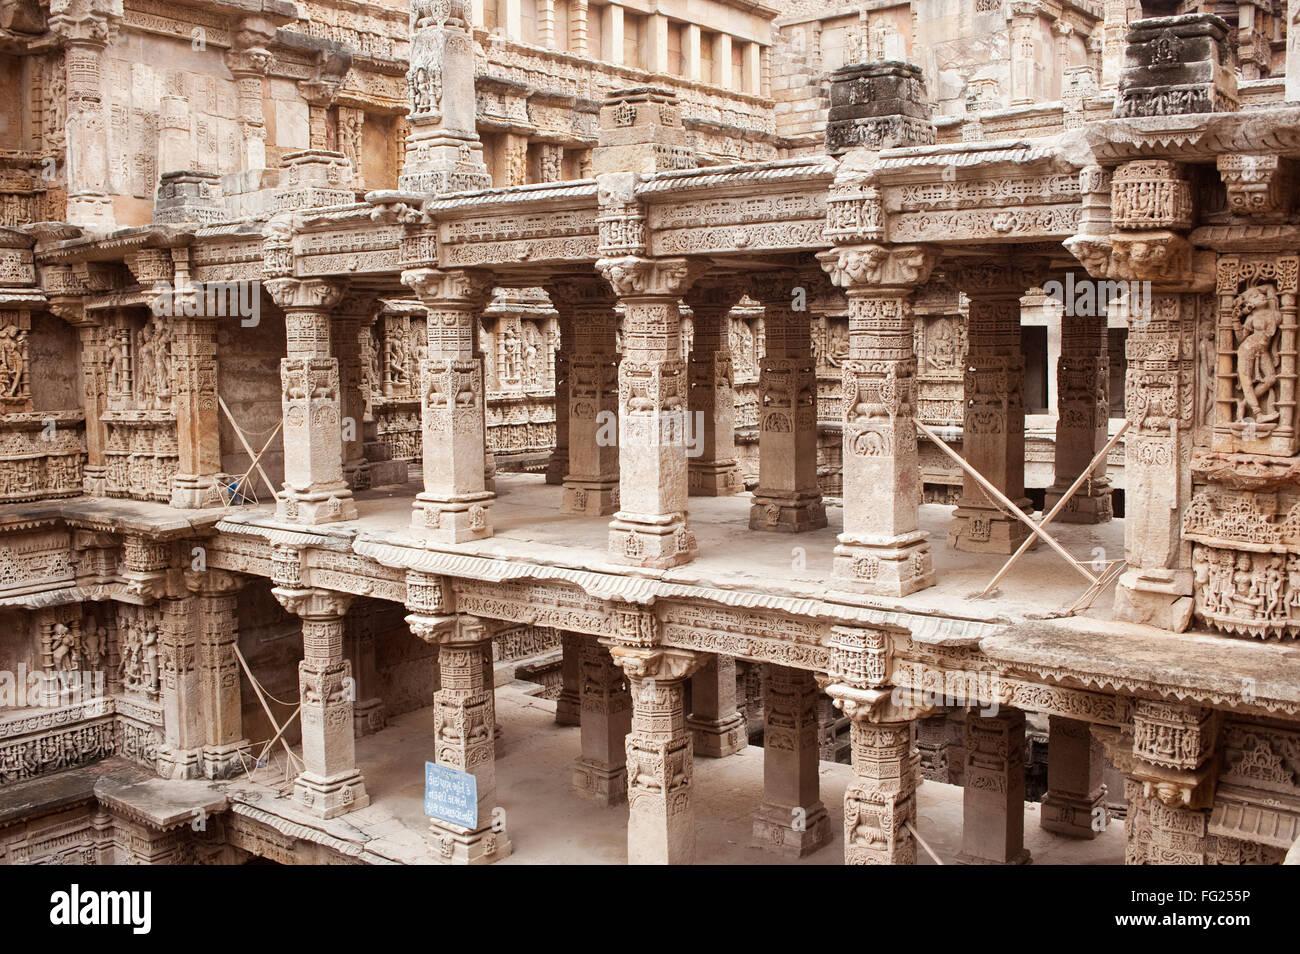 Evan ; pillars at queens step well ; Patan ; Gujarat ; India - Stock Image